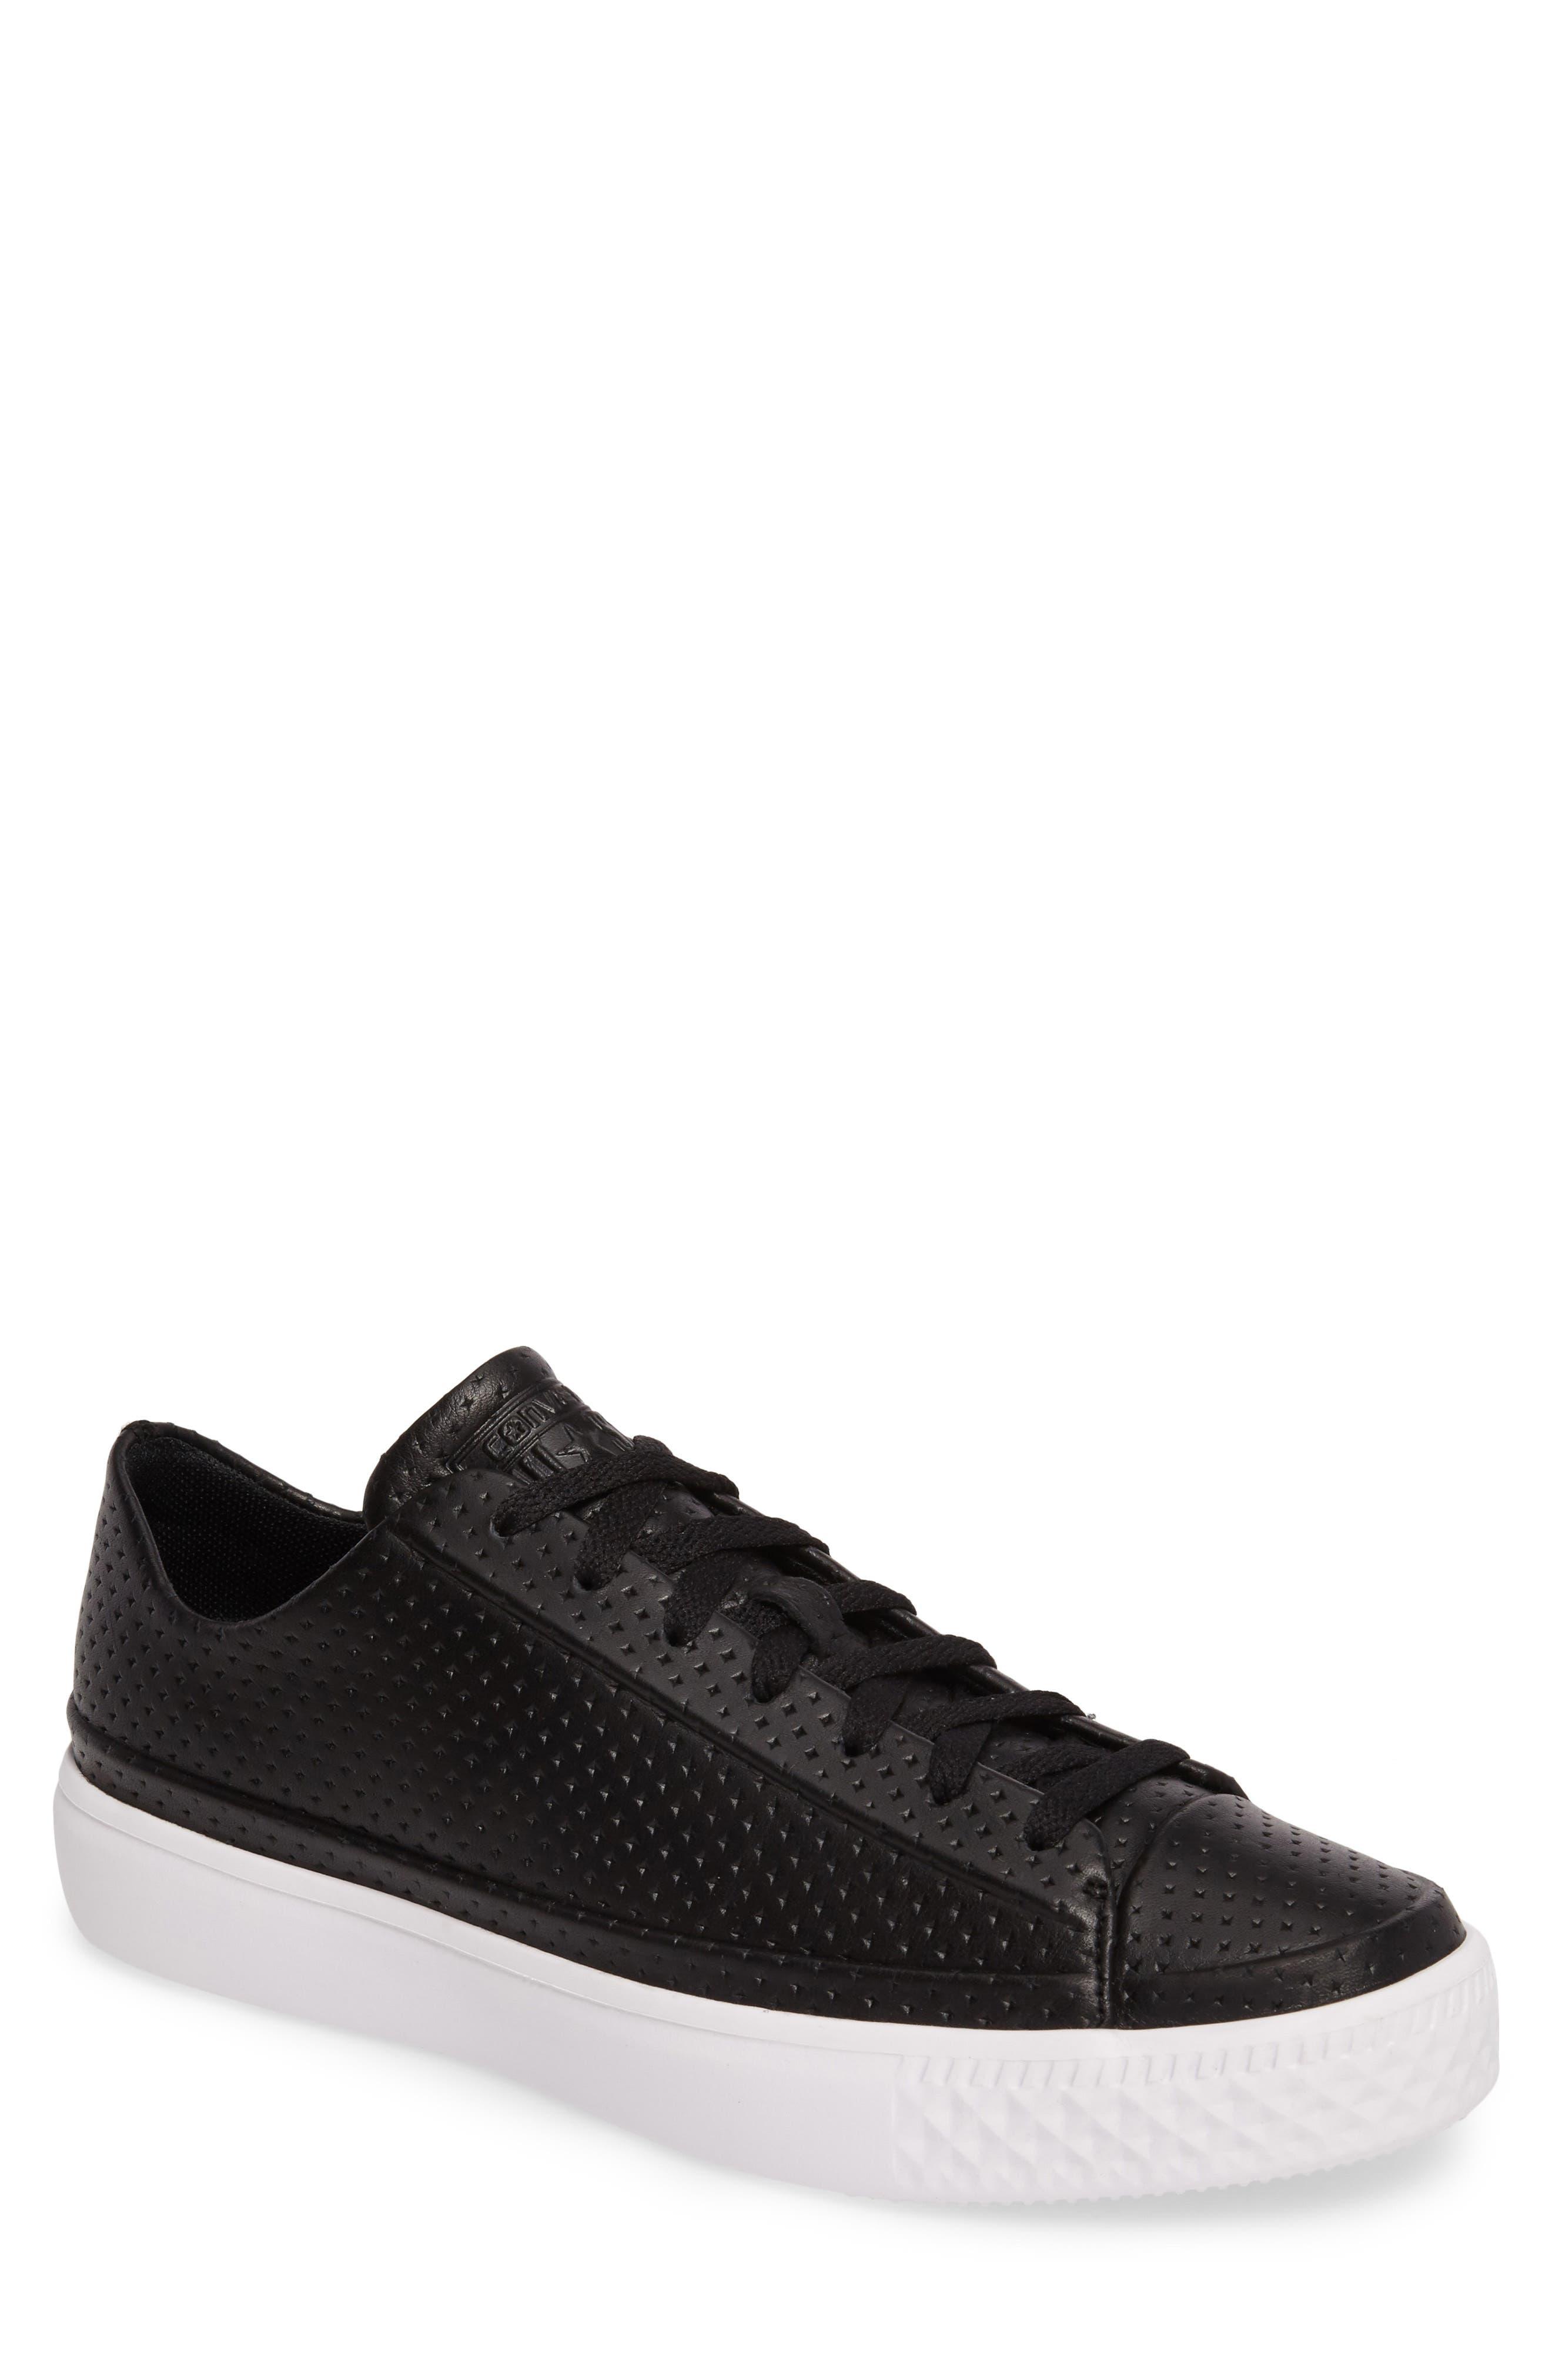 Converse Modern Ox Sneaker (Men)